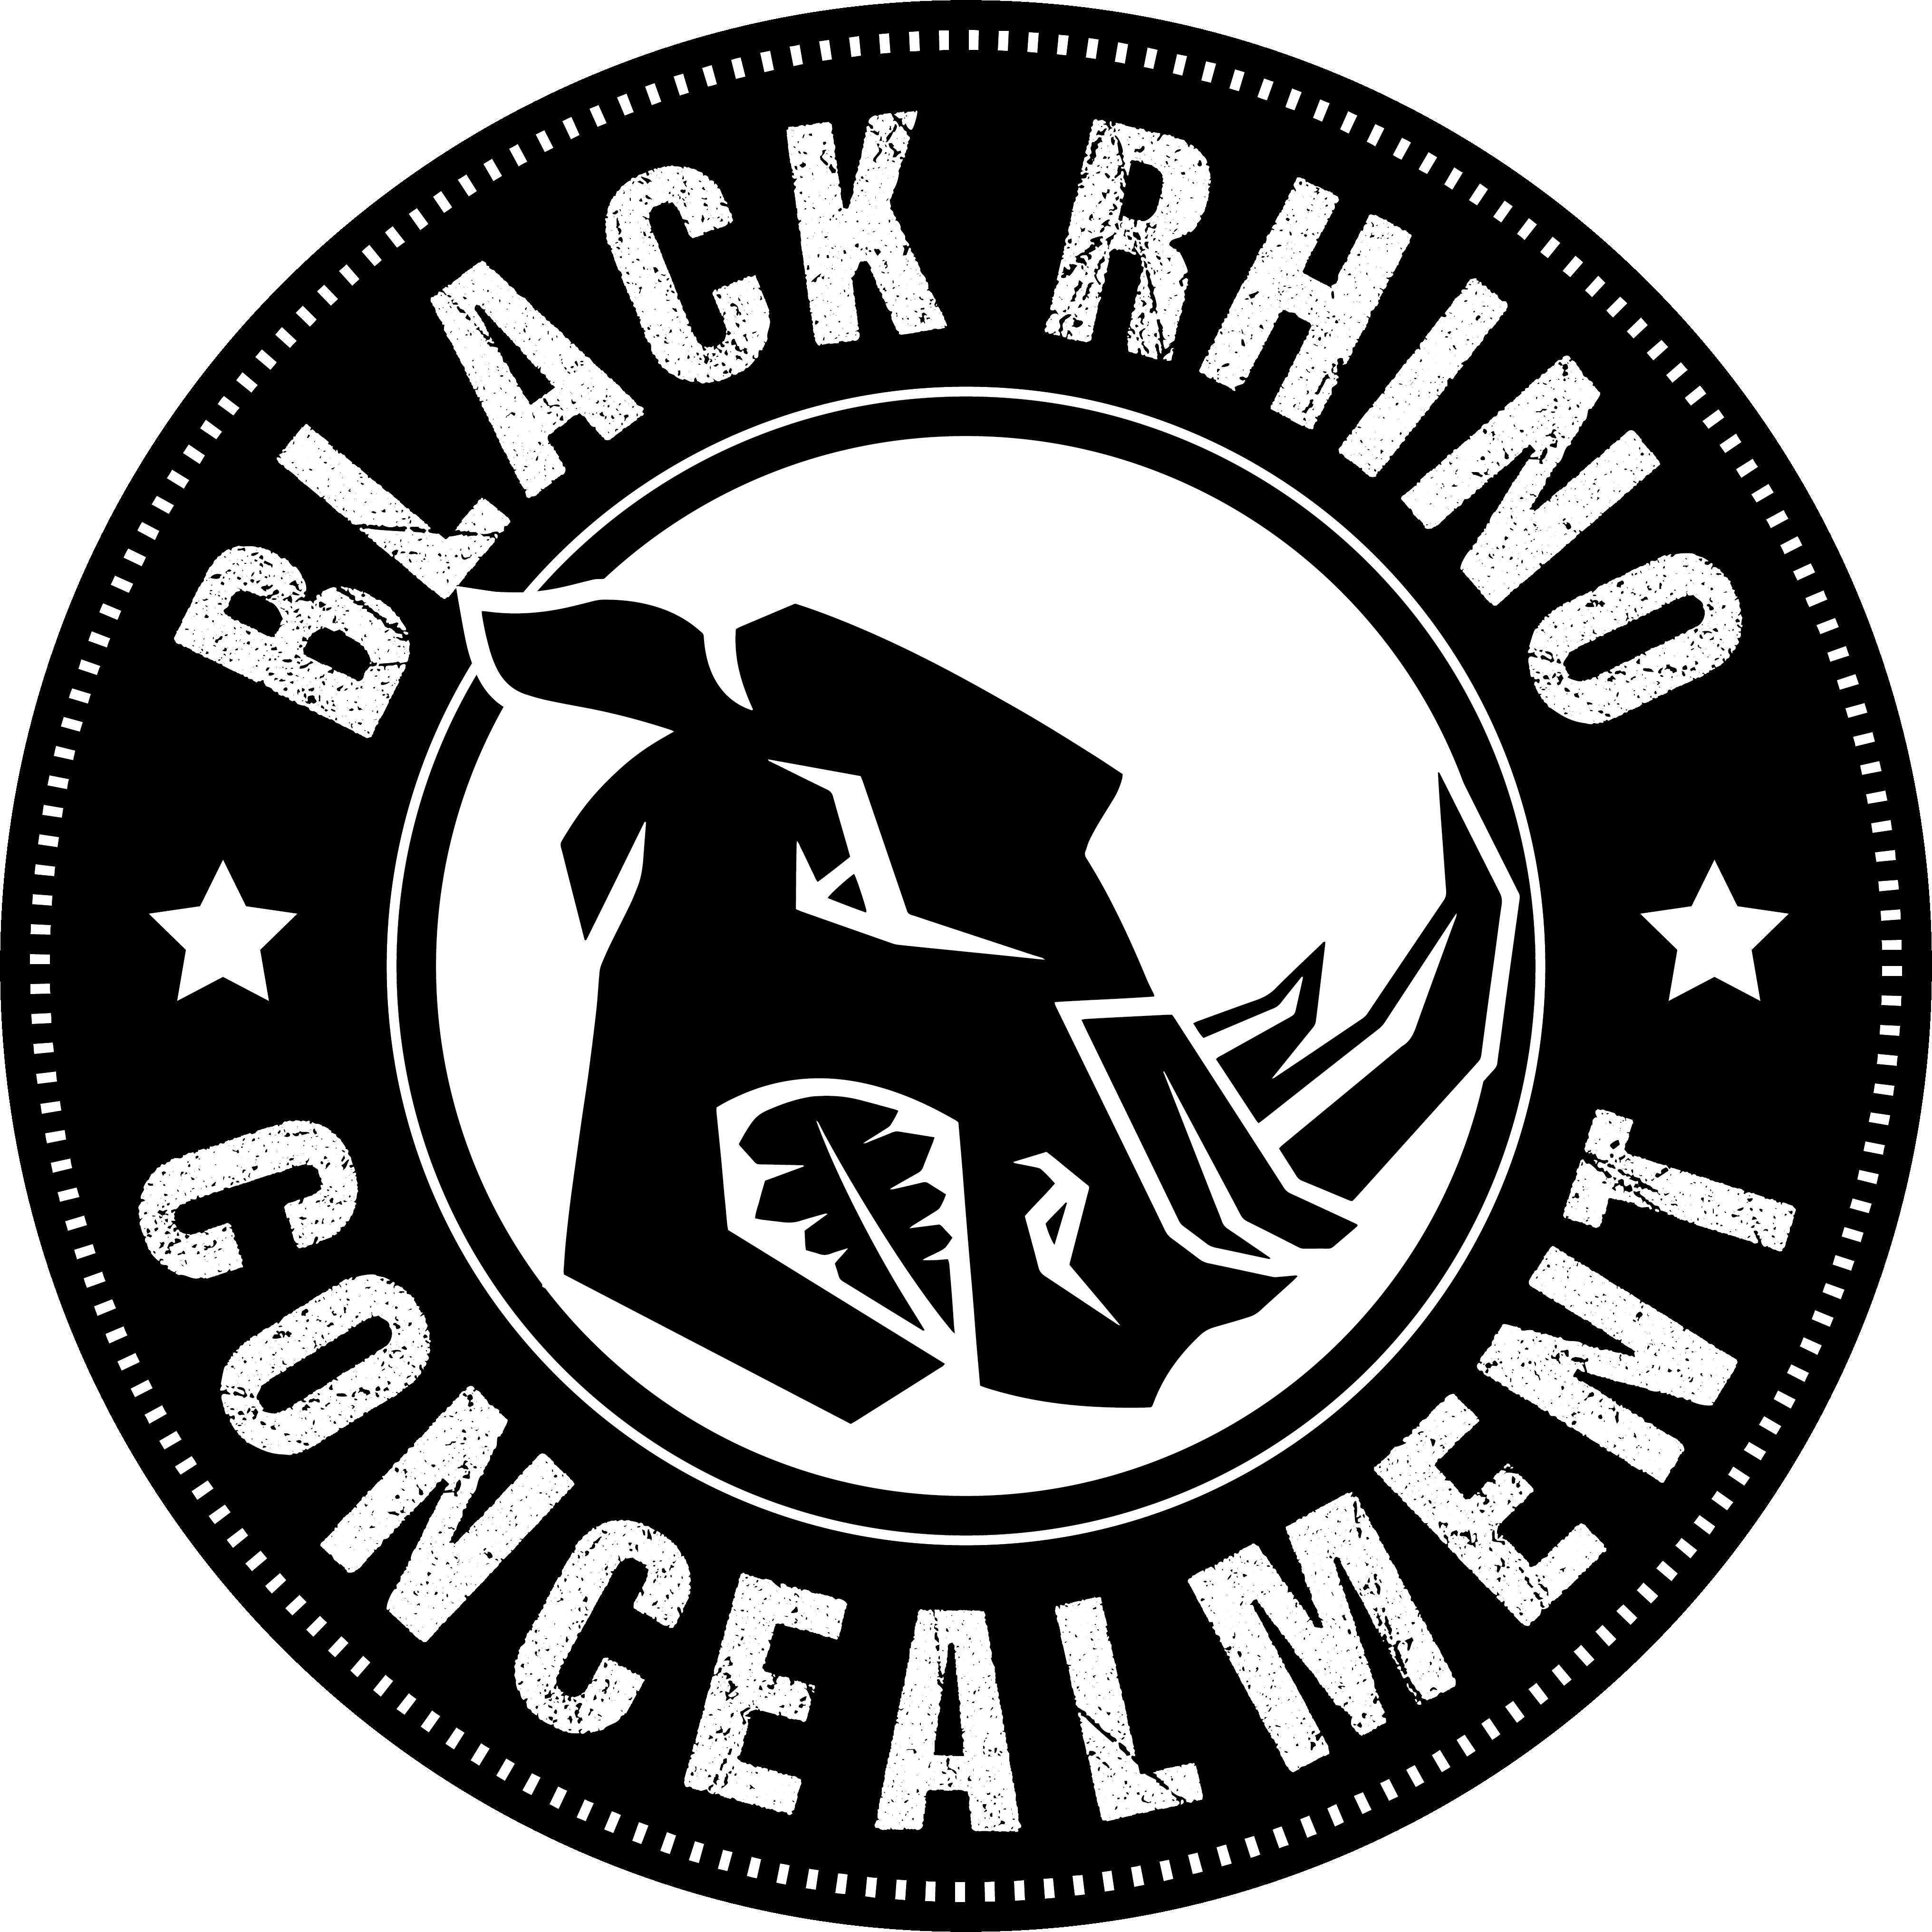 blackrhinoconcealment.com